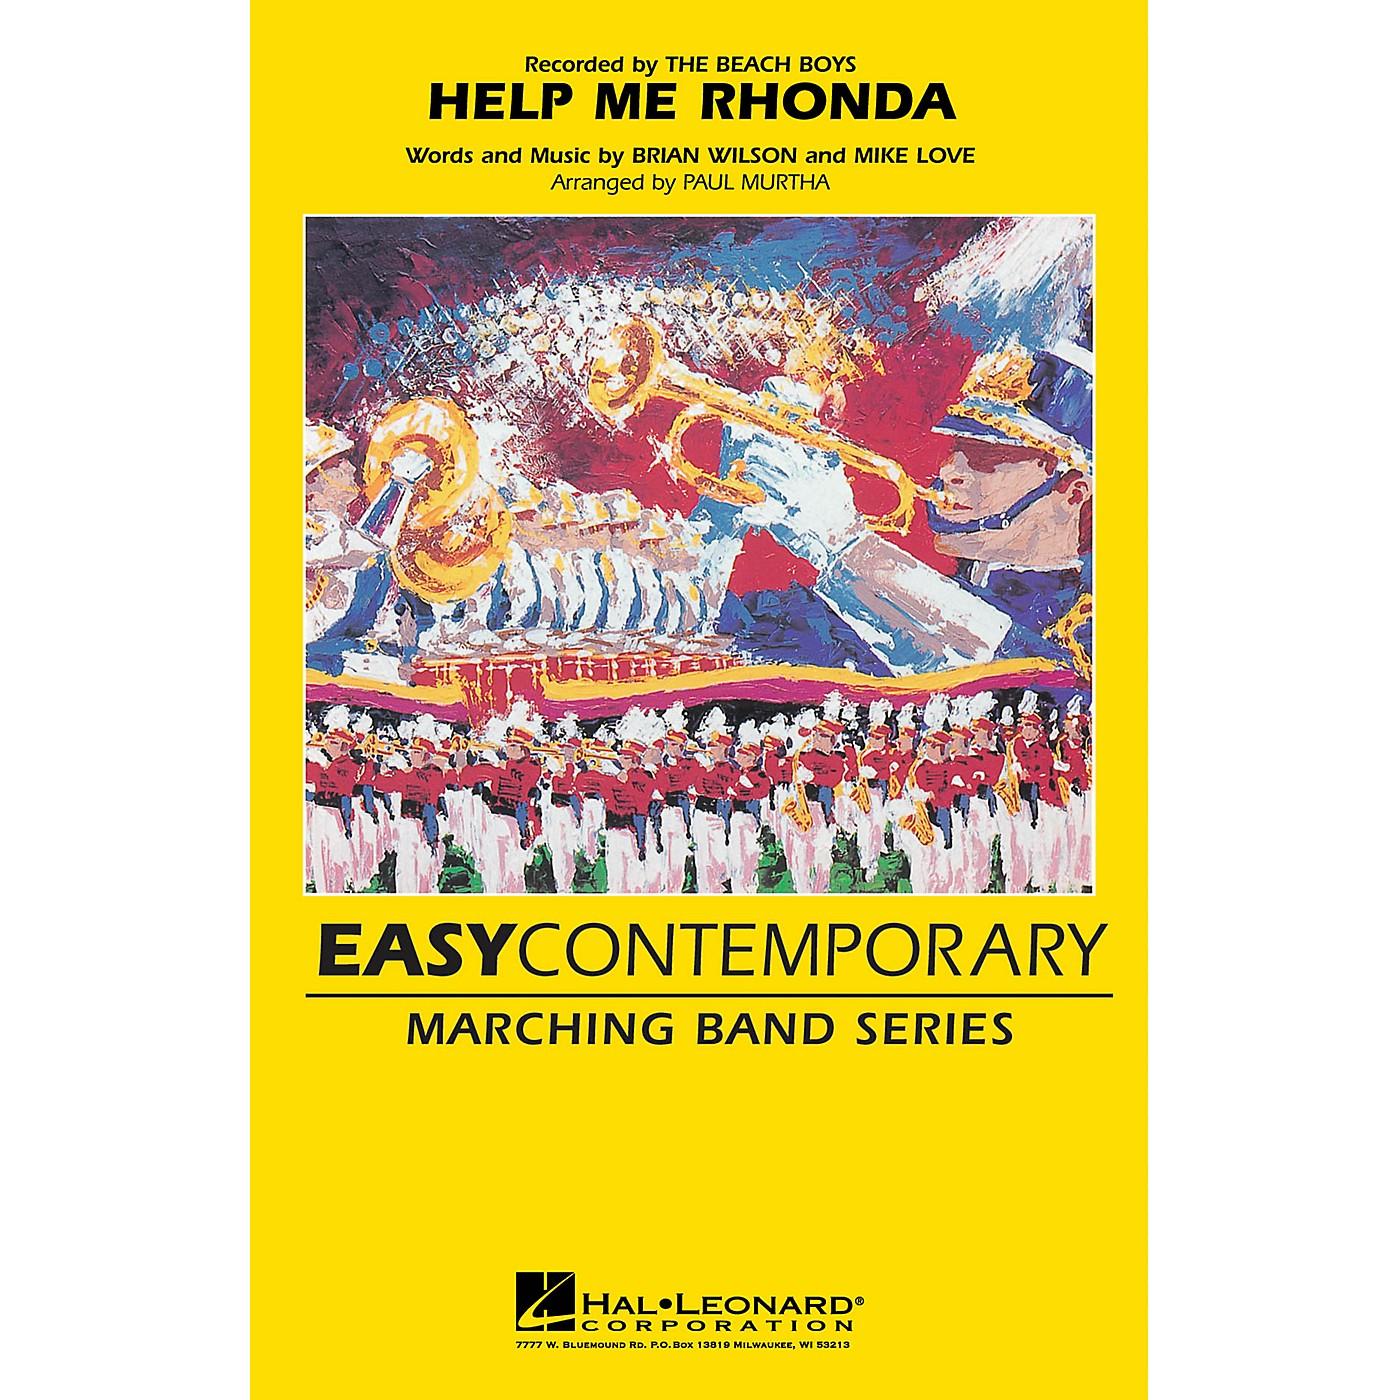 Hal Leonard Help Me Rhonda Marching Band Level 2-3 by The Beach Boys Arranged by Paul Murtha thumbnail